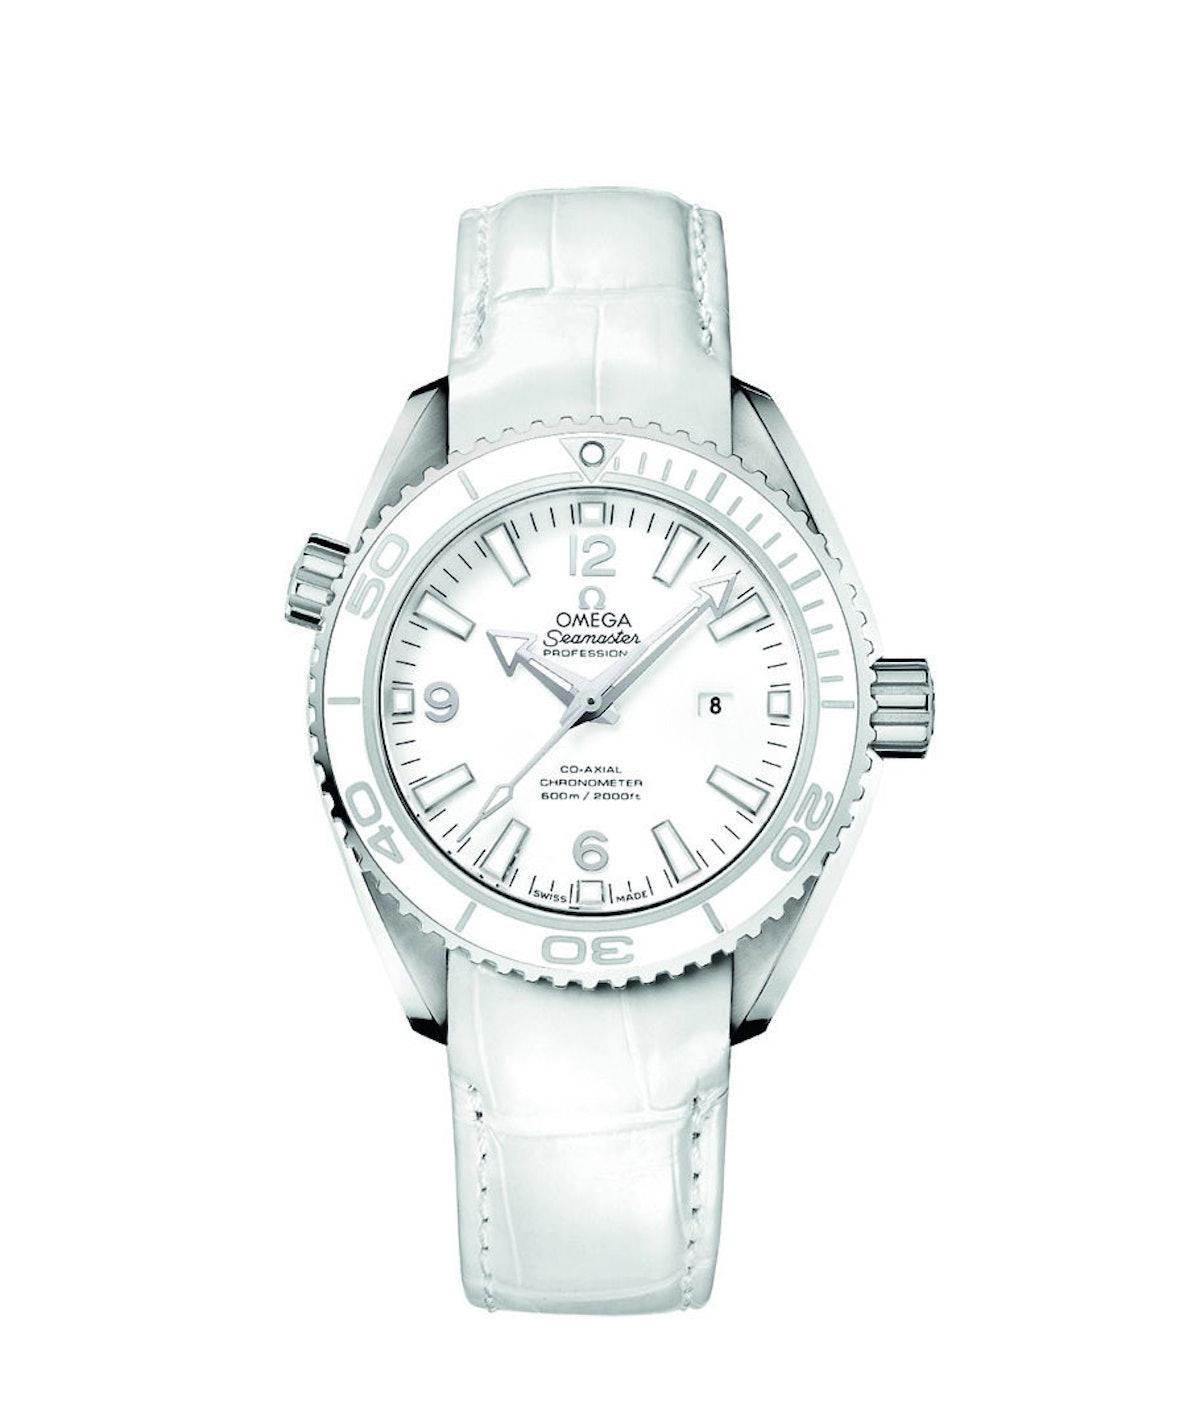 Omega white watch